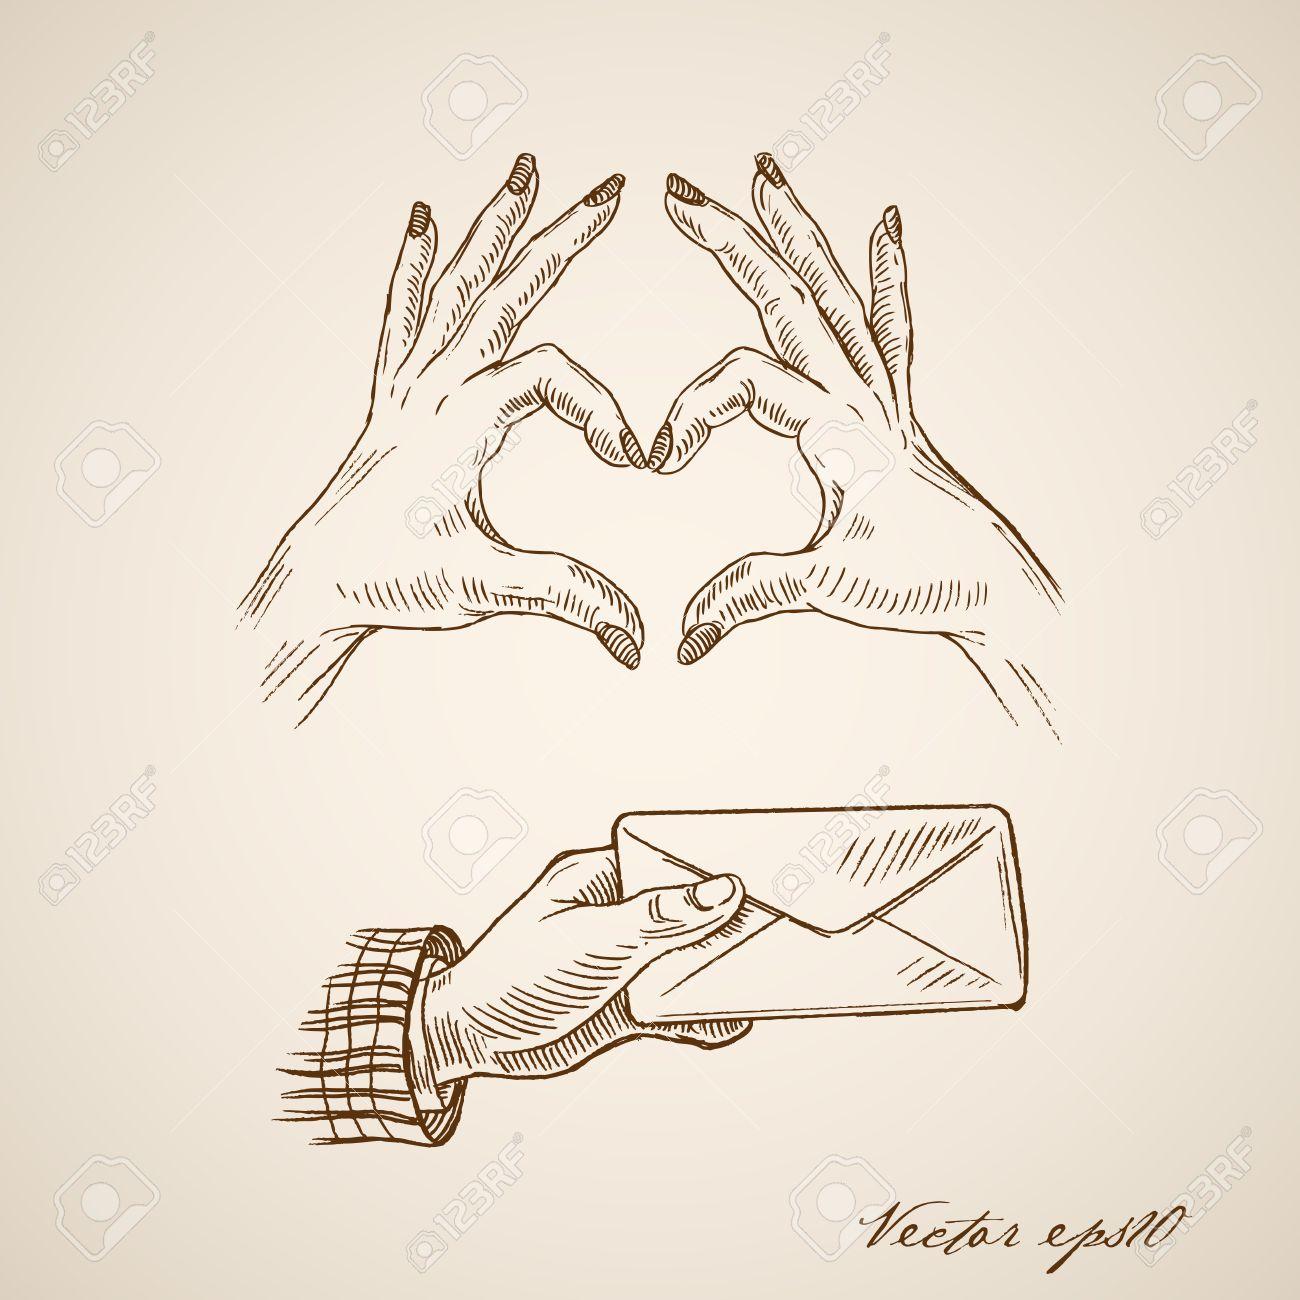 1300x1300 Engraving Vintage Hand Drawn Female Hands Making Heart Symbol